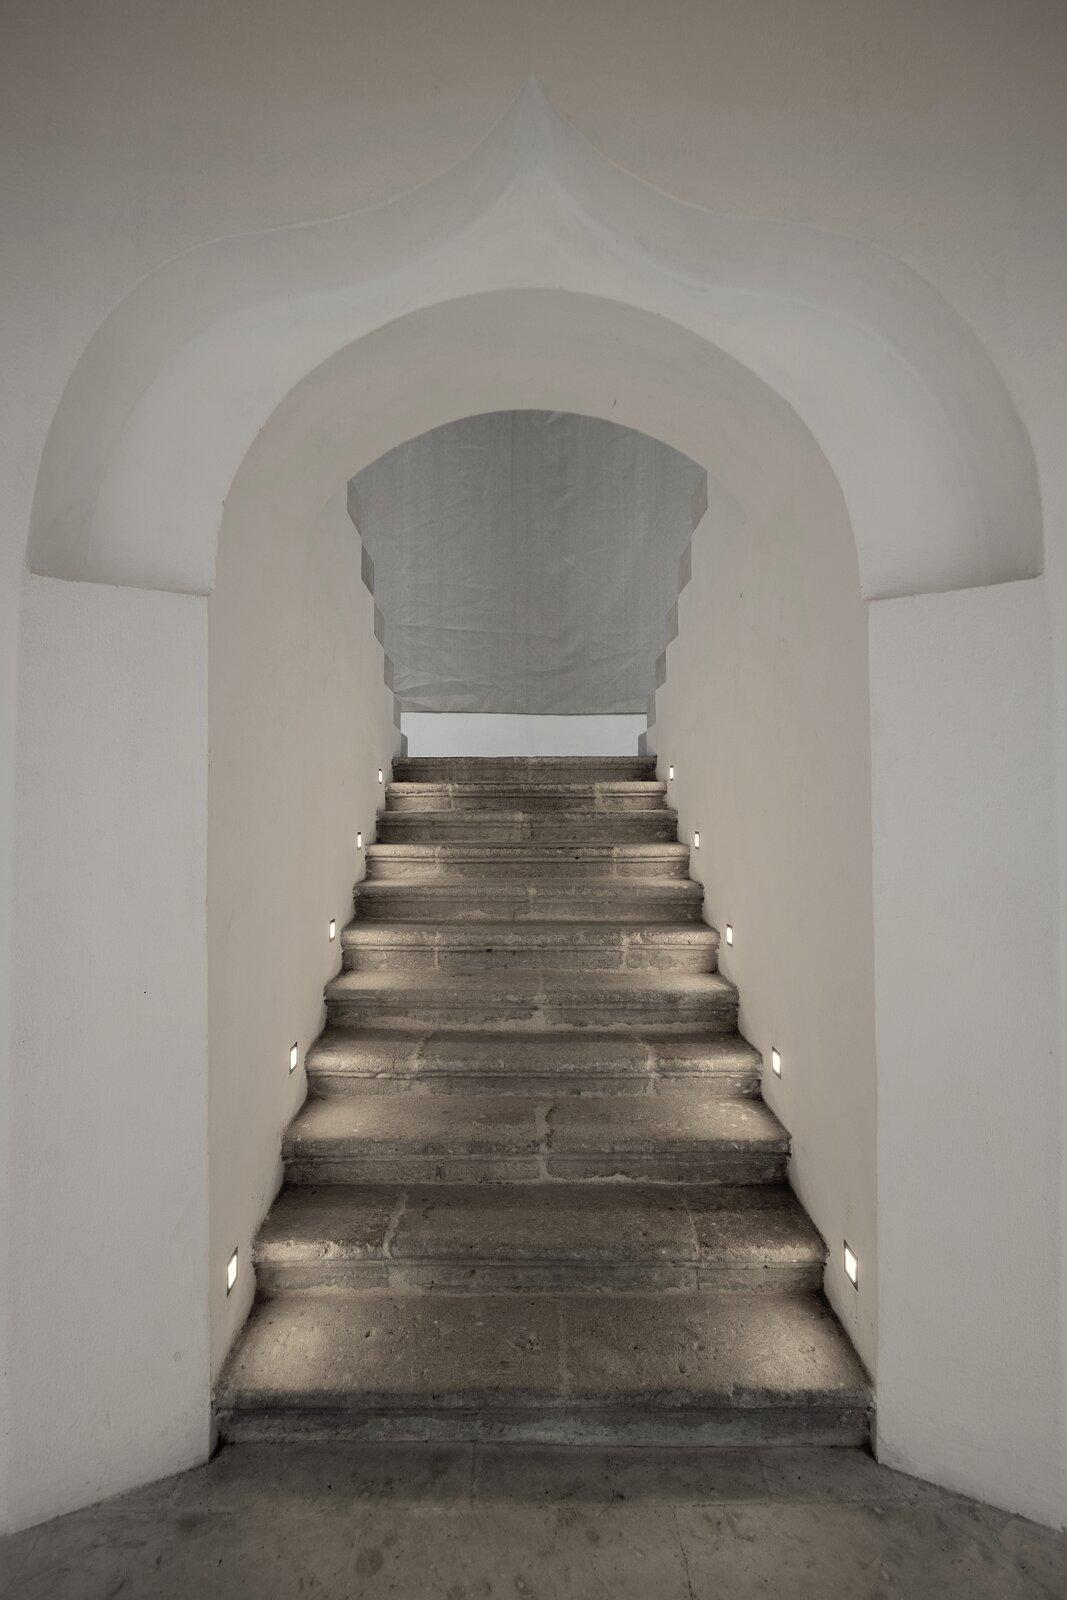 Hotel Sin Nombre staircase